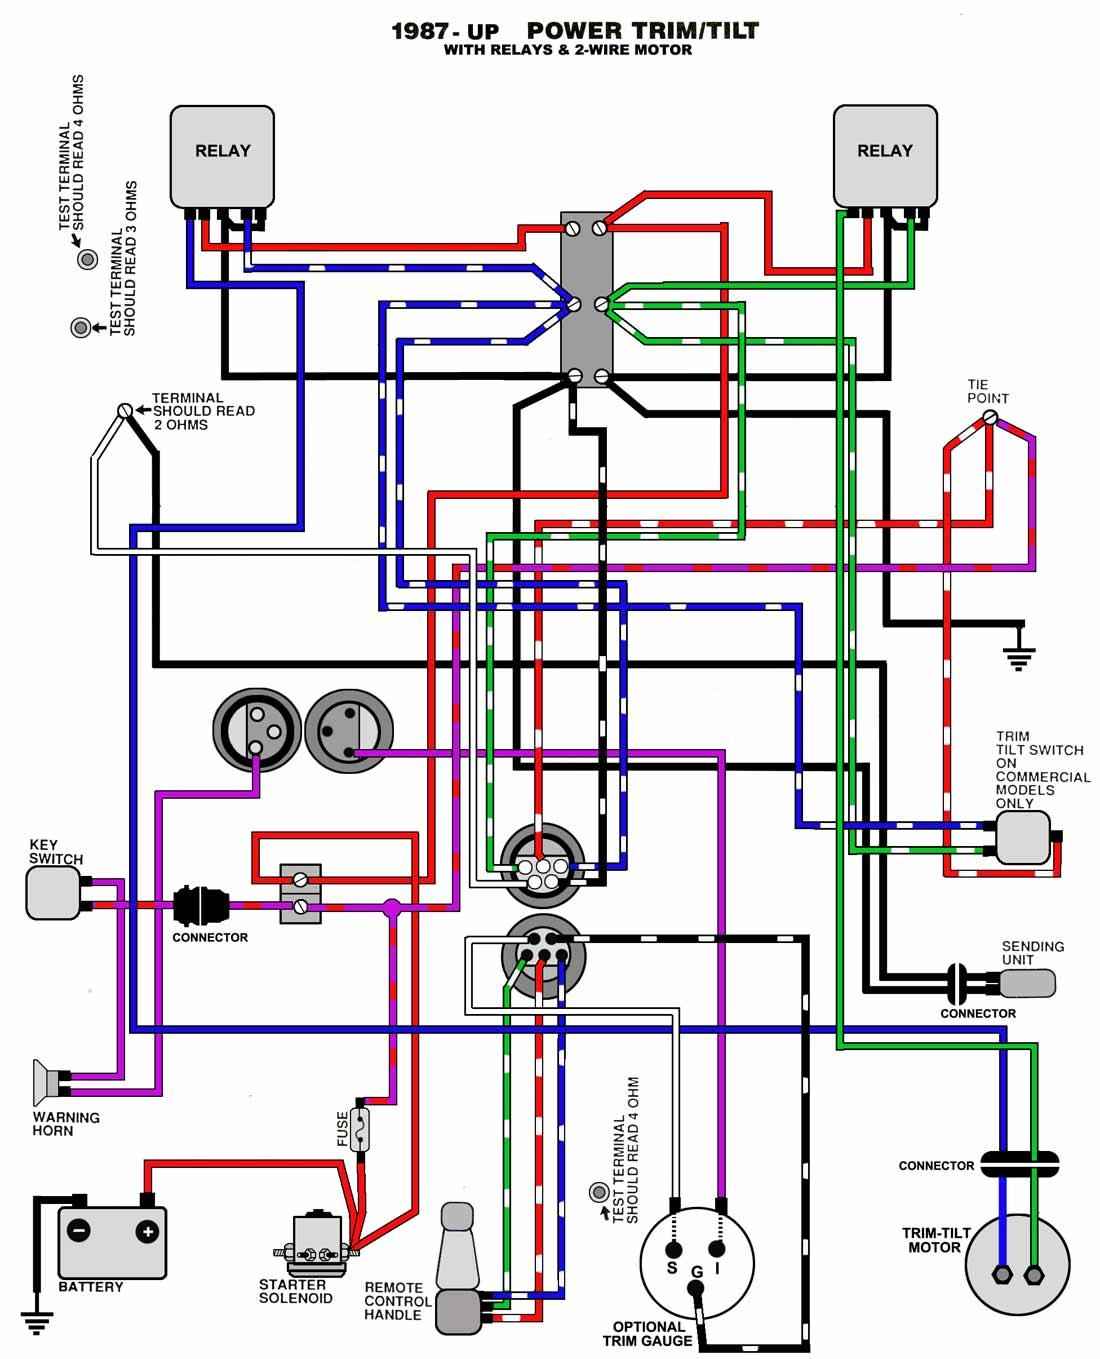 Sensational Yamaha Boat Motor Wiring Diagram Wiring Diagram Data Wiring Cloud Icalpermsplehendilmohammedshrineorg